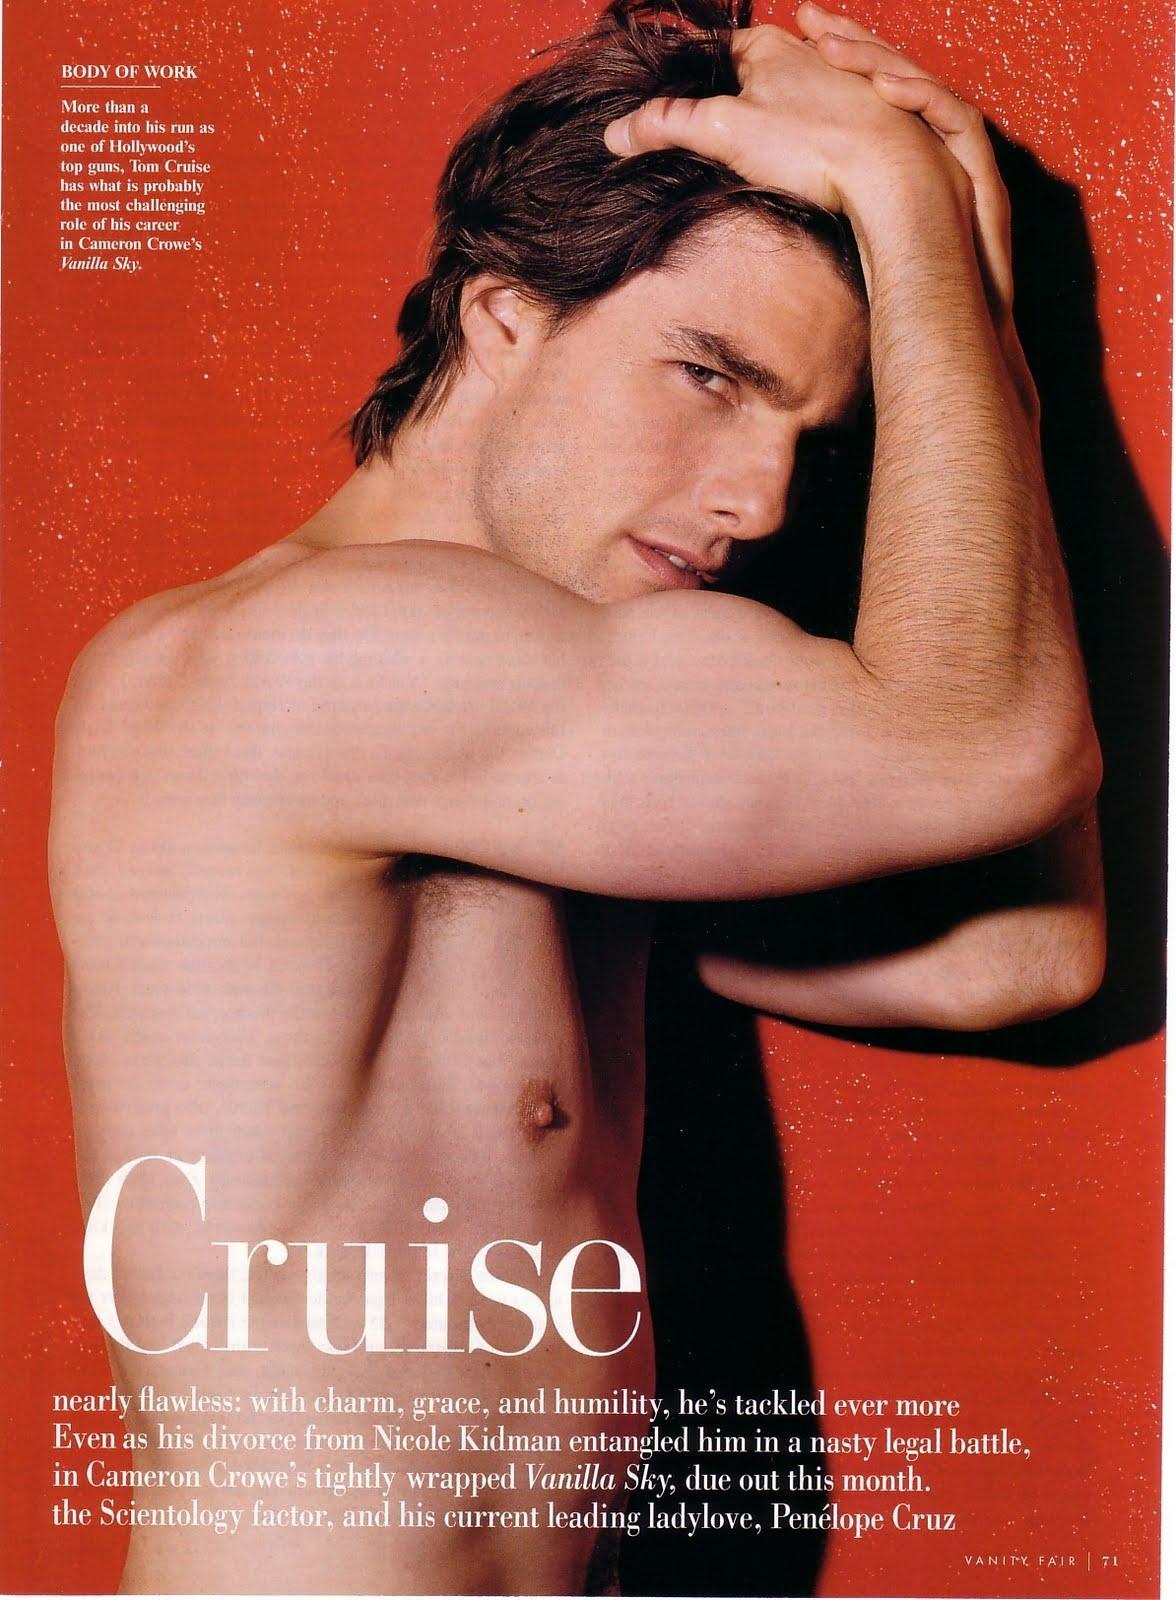 http://3.bp.blogspot.com/_a9rIKnq6Q34/TC_Ww9J2CjI/AAAAAAAAAEs/4zMS9U5EN0c/s1600/Tom-Cruise-tom-cruise-4182392-1194-1624.jpg